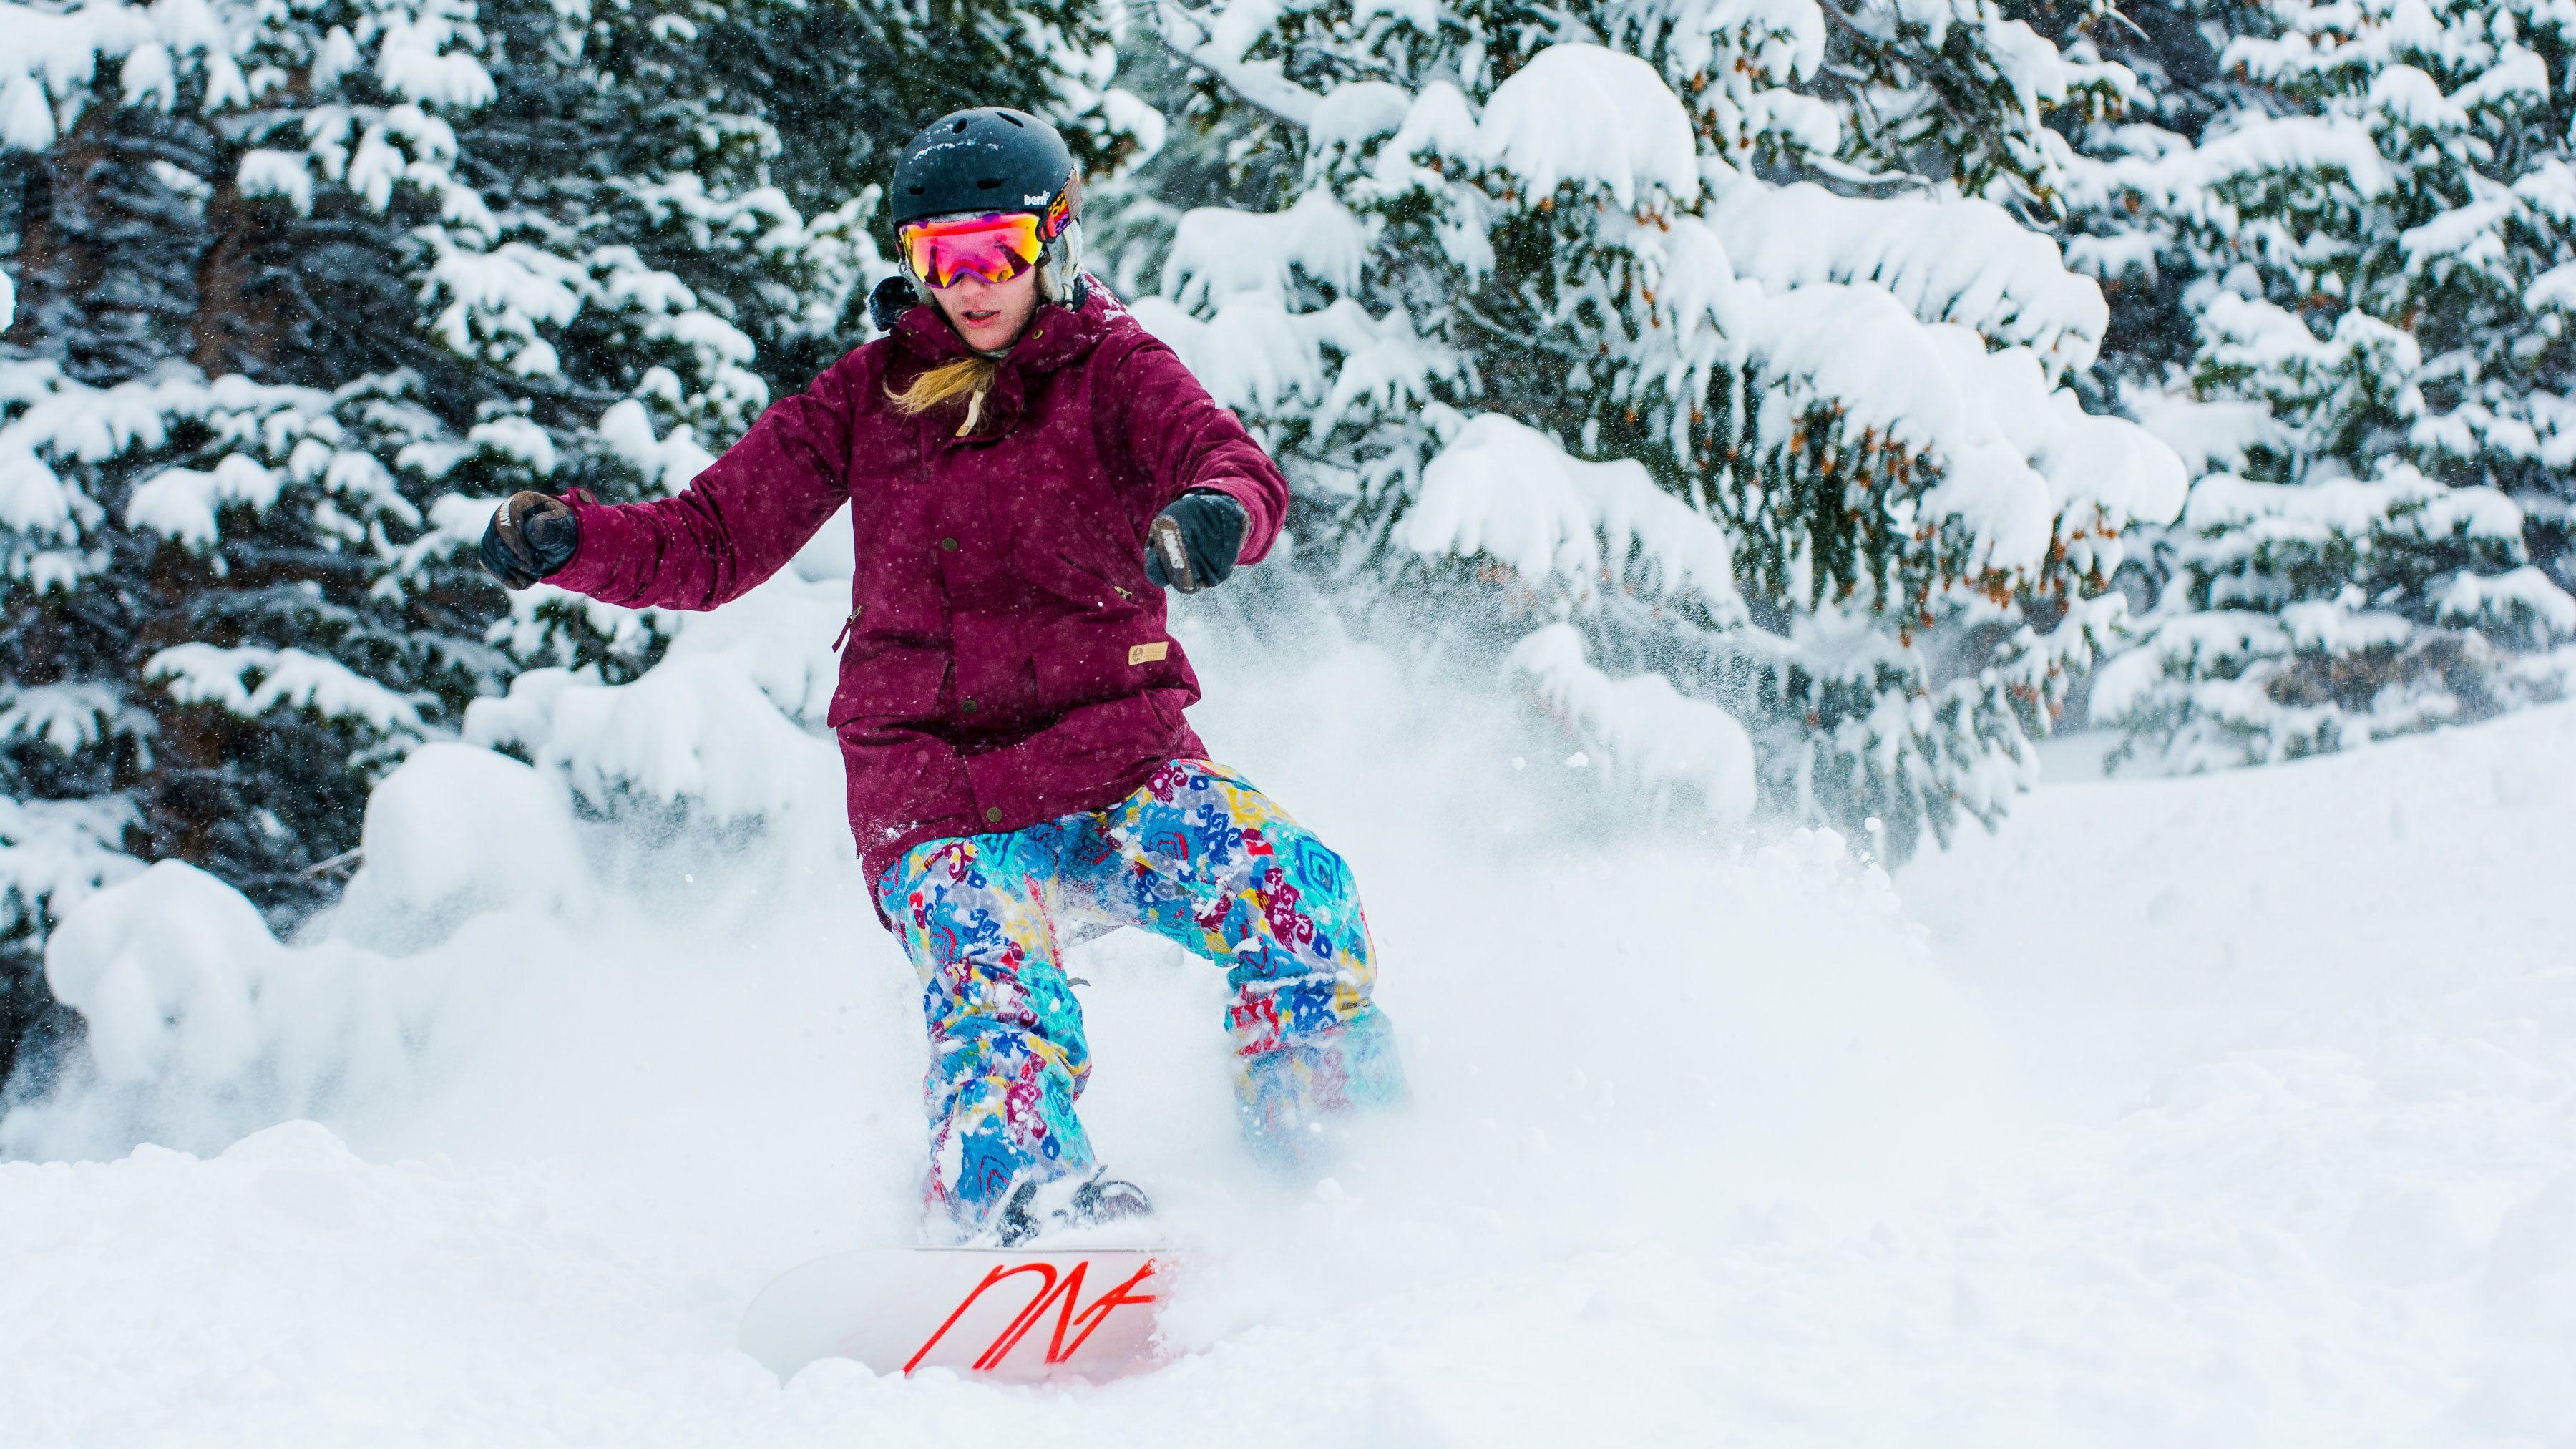 Snowboarder shredding powder